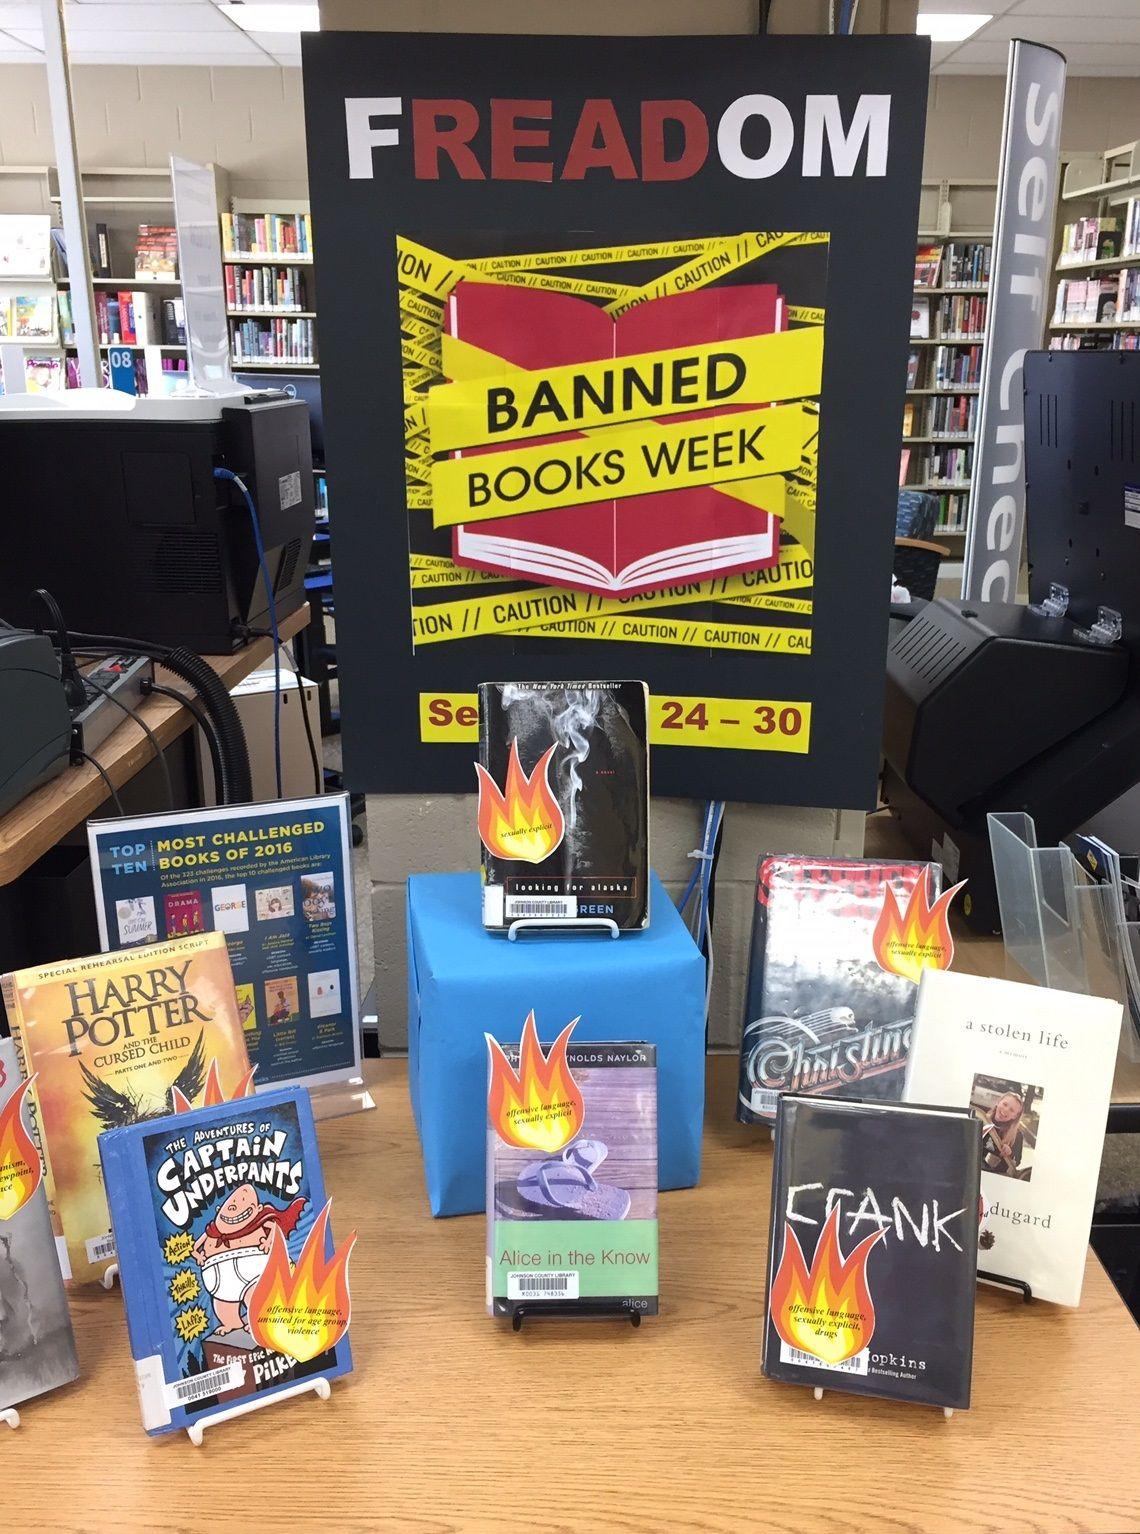 Banned books week display 2017 library book displays